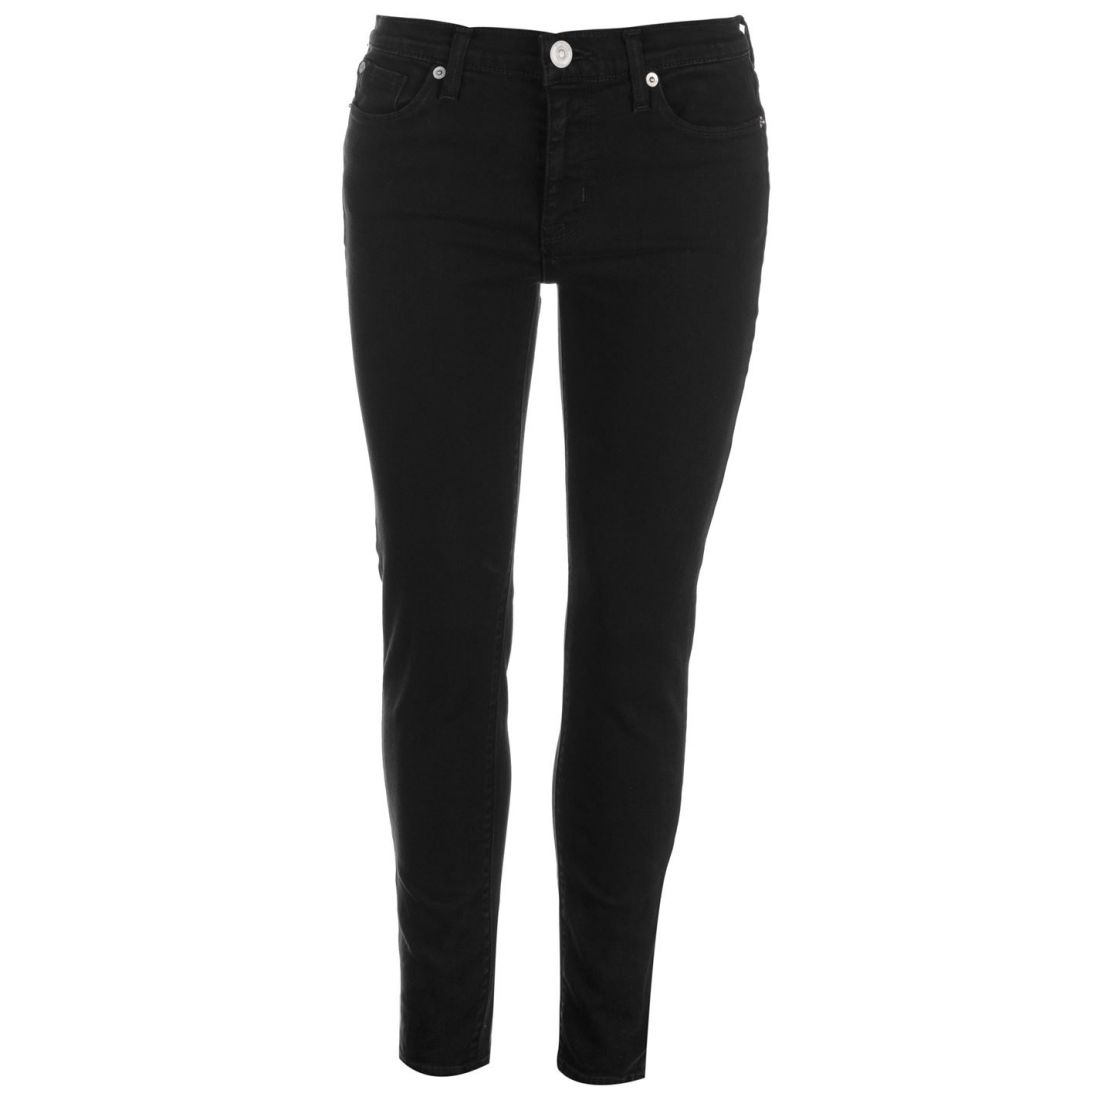 d581848b0 Hudson Jeans Midrise Nico Ladies Skinny Pants Trousers Bottoms